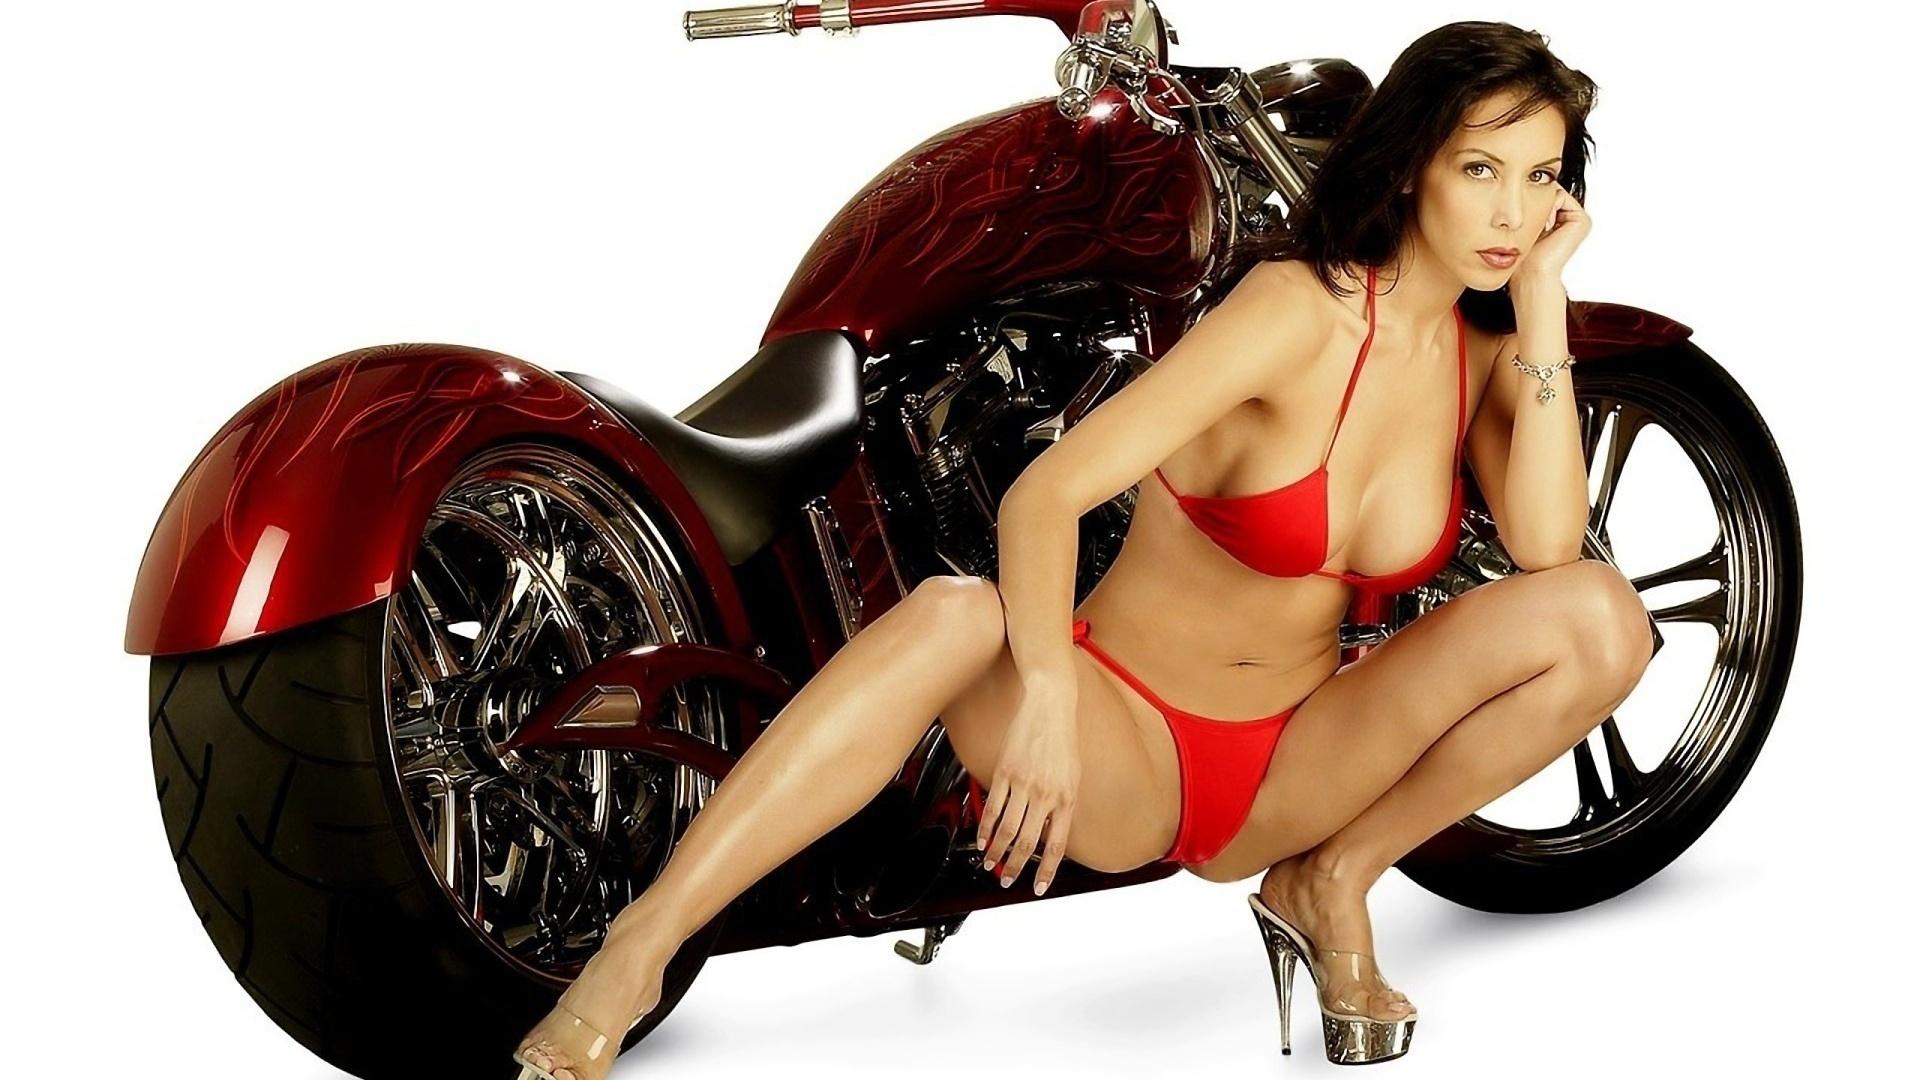 Целки на мотоциклах 26 фотография